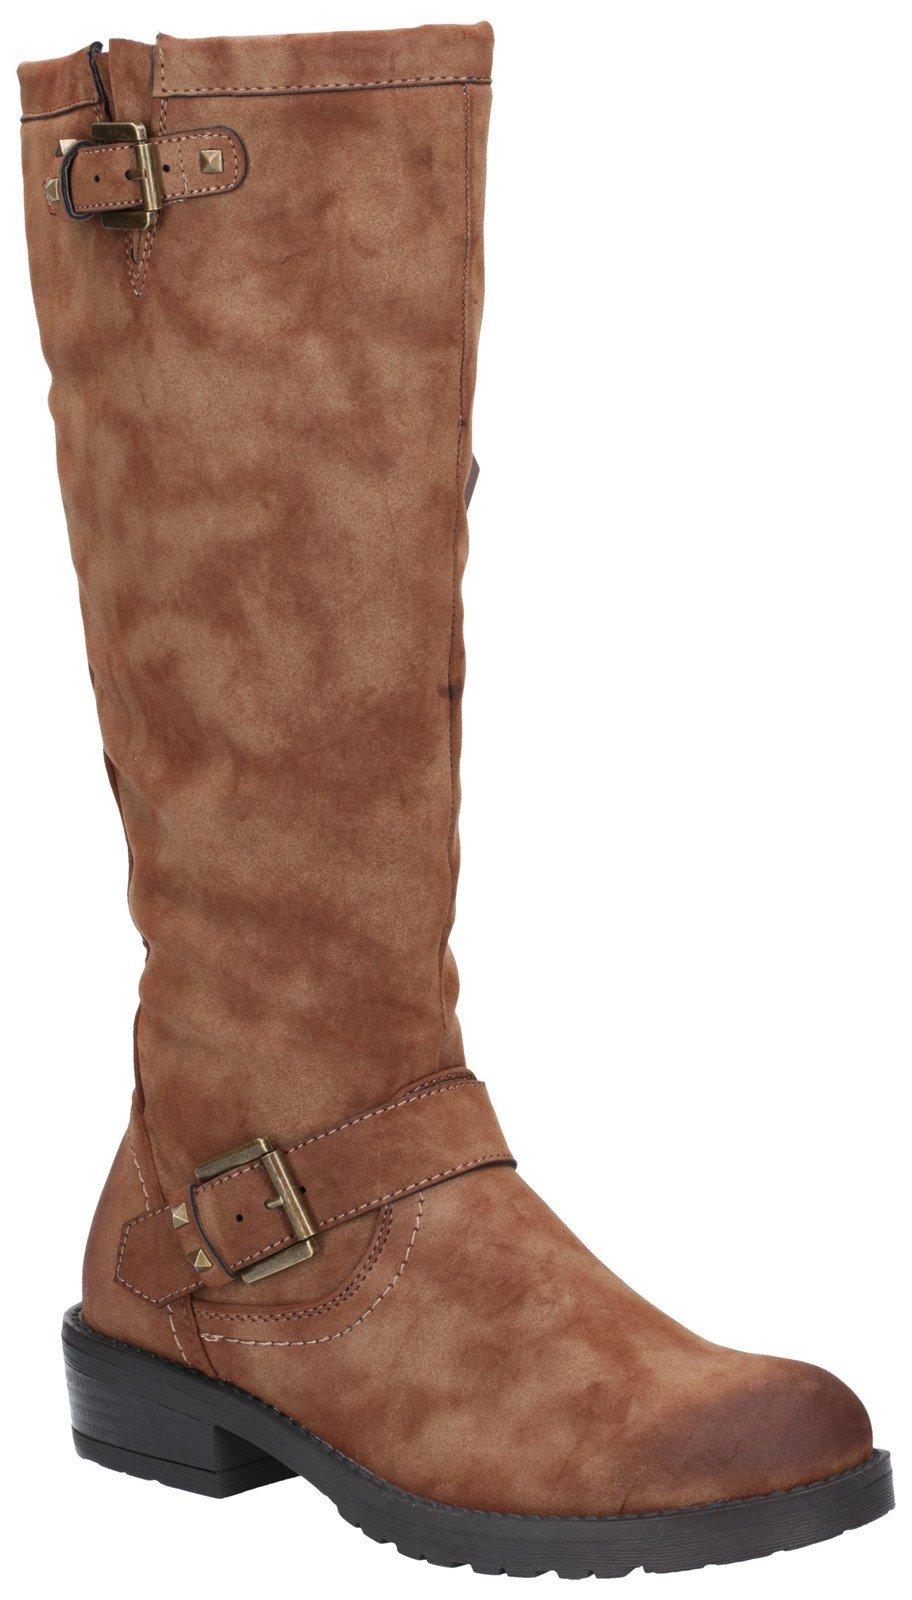 Divaz Women's Courtney Zip Up Boot Black 27167-45653 - Tan 3